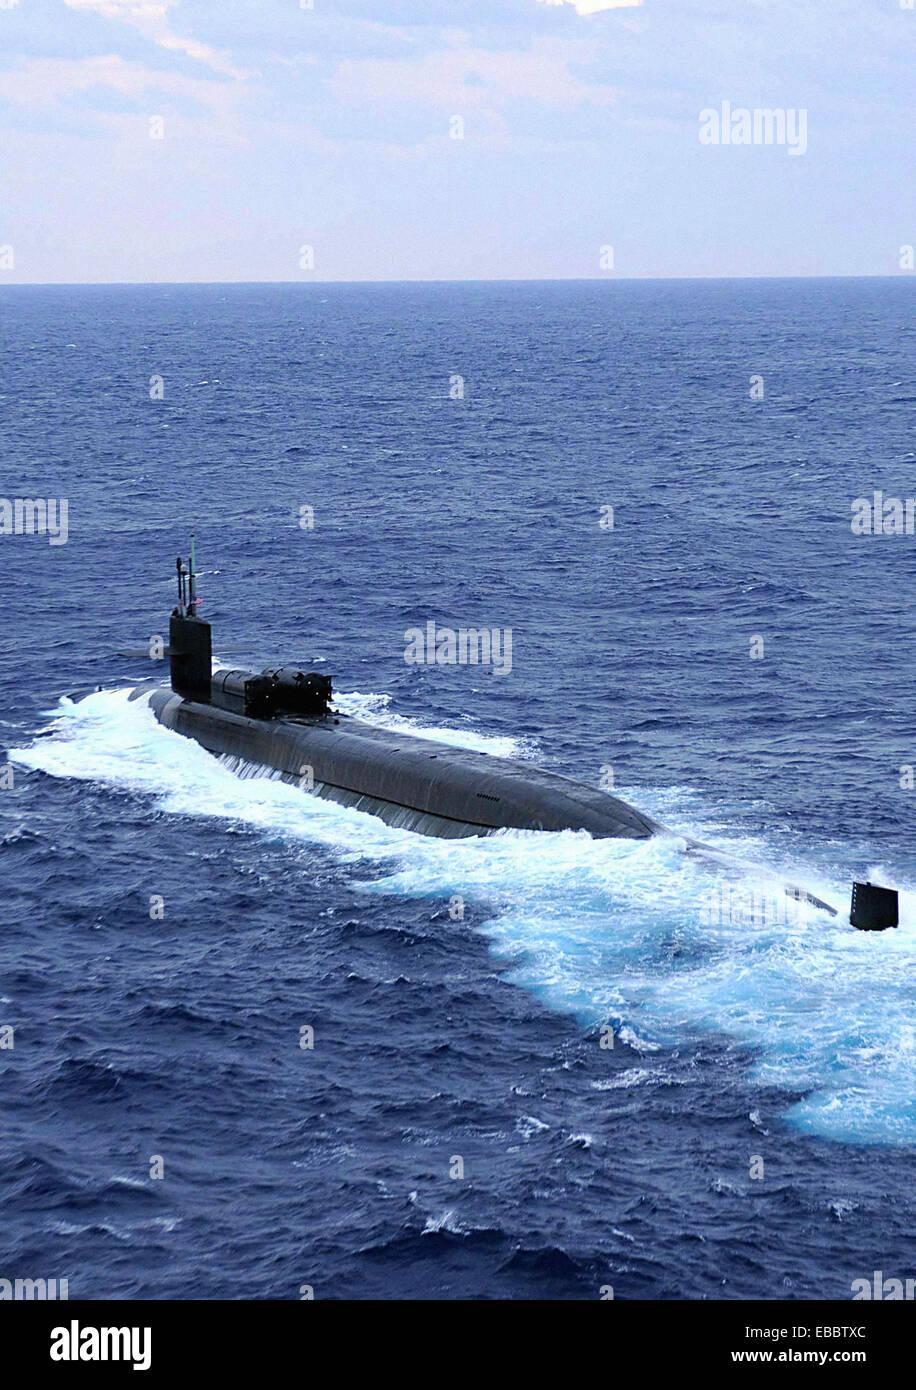 Océano Pacífico (Nov. 19, 2008) El submarino de misiles guiados USS Ohio (SSGN 726) está en marcha Imagen De Stock